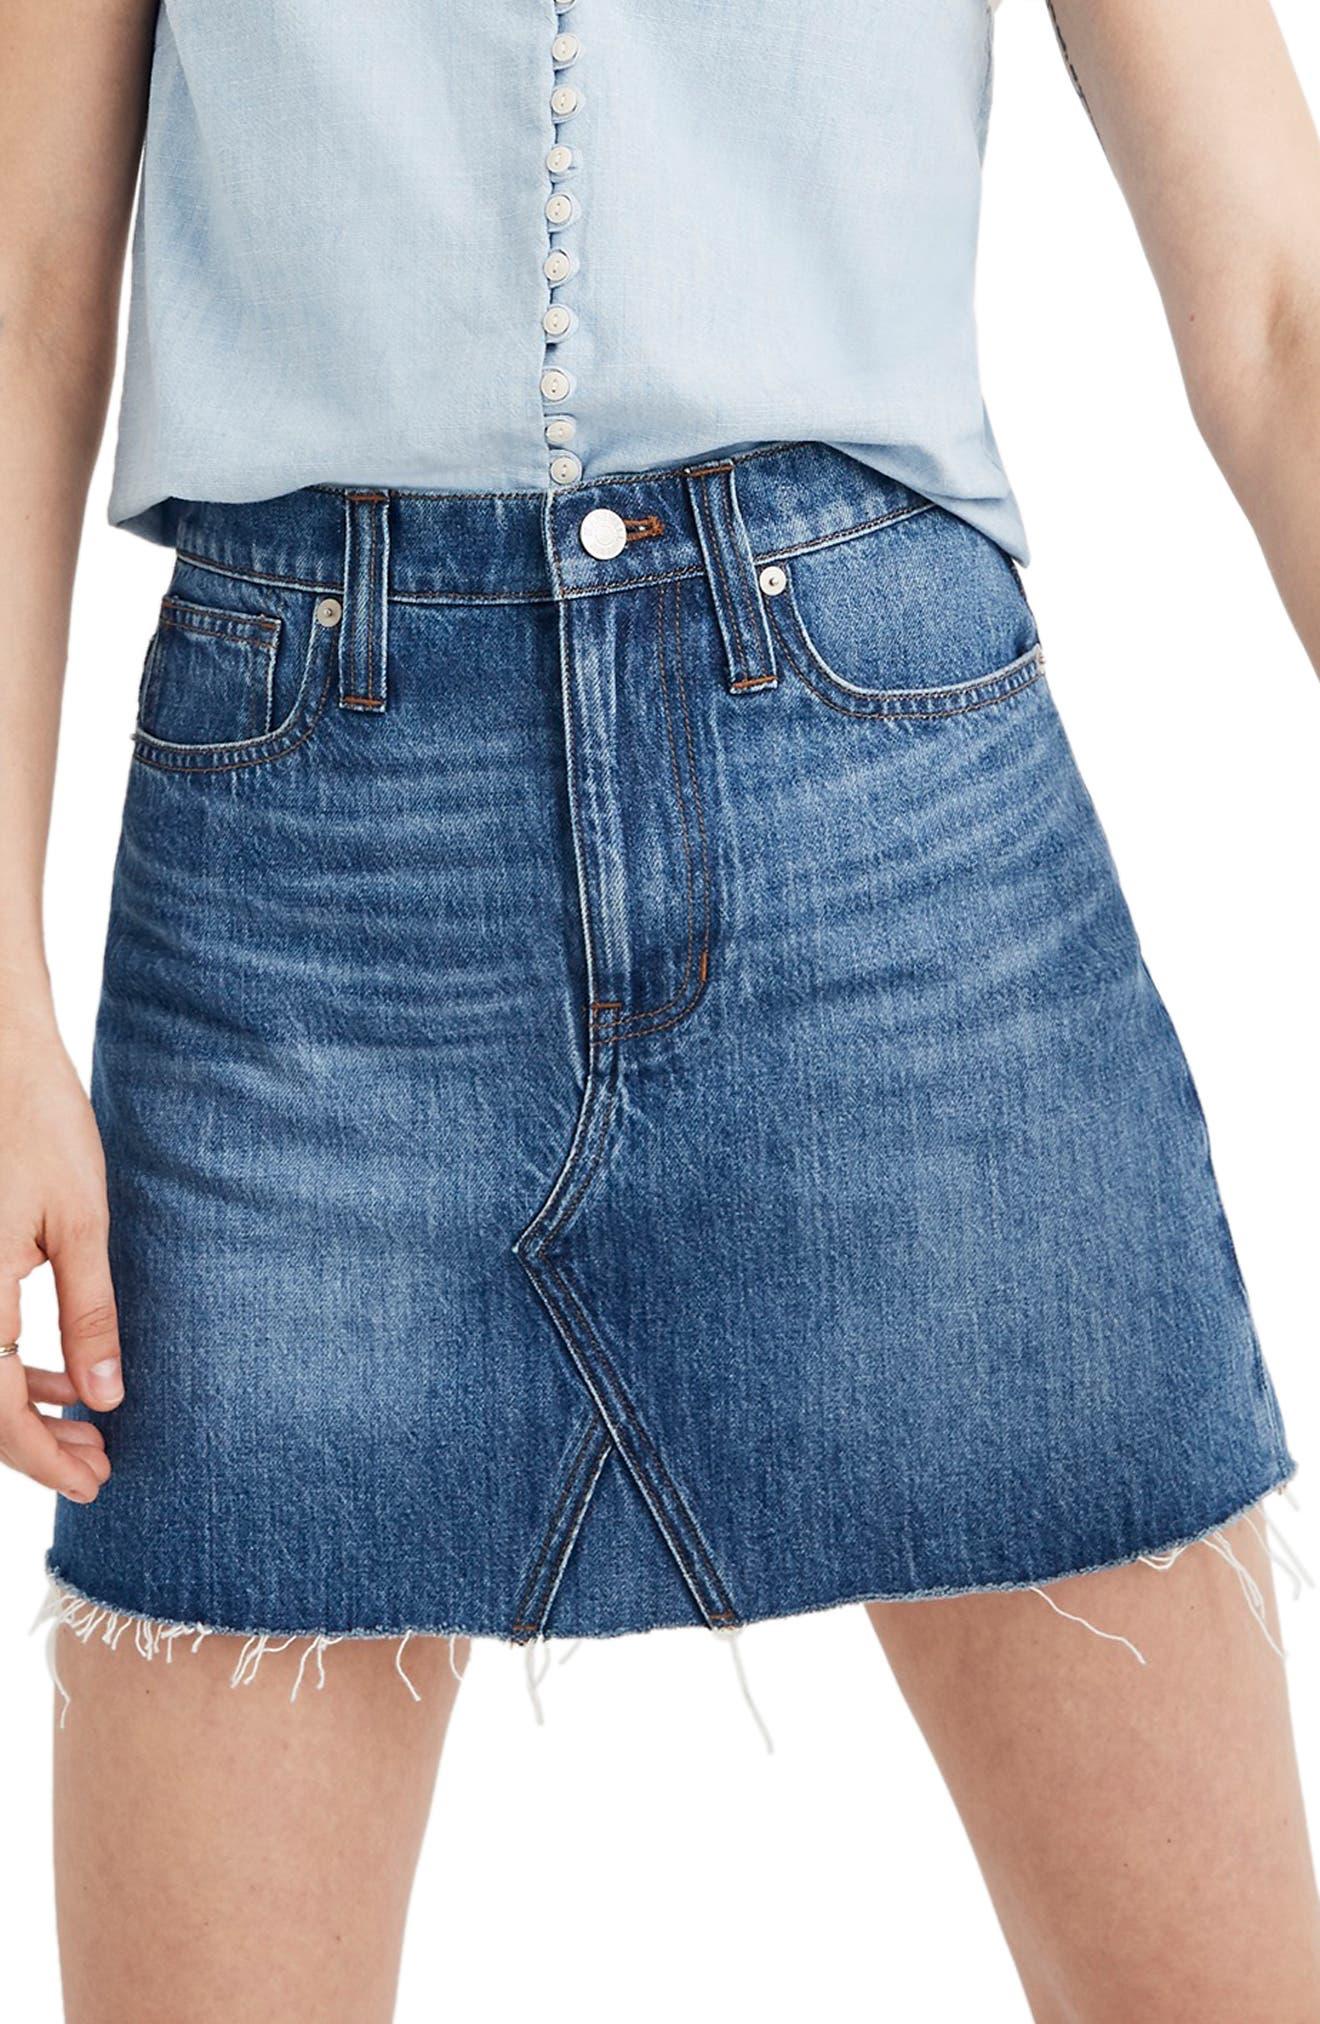 Madewell Eco Edition Rigid Denim A-Line Miniskirt, 7 - Blue